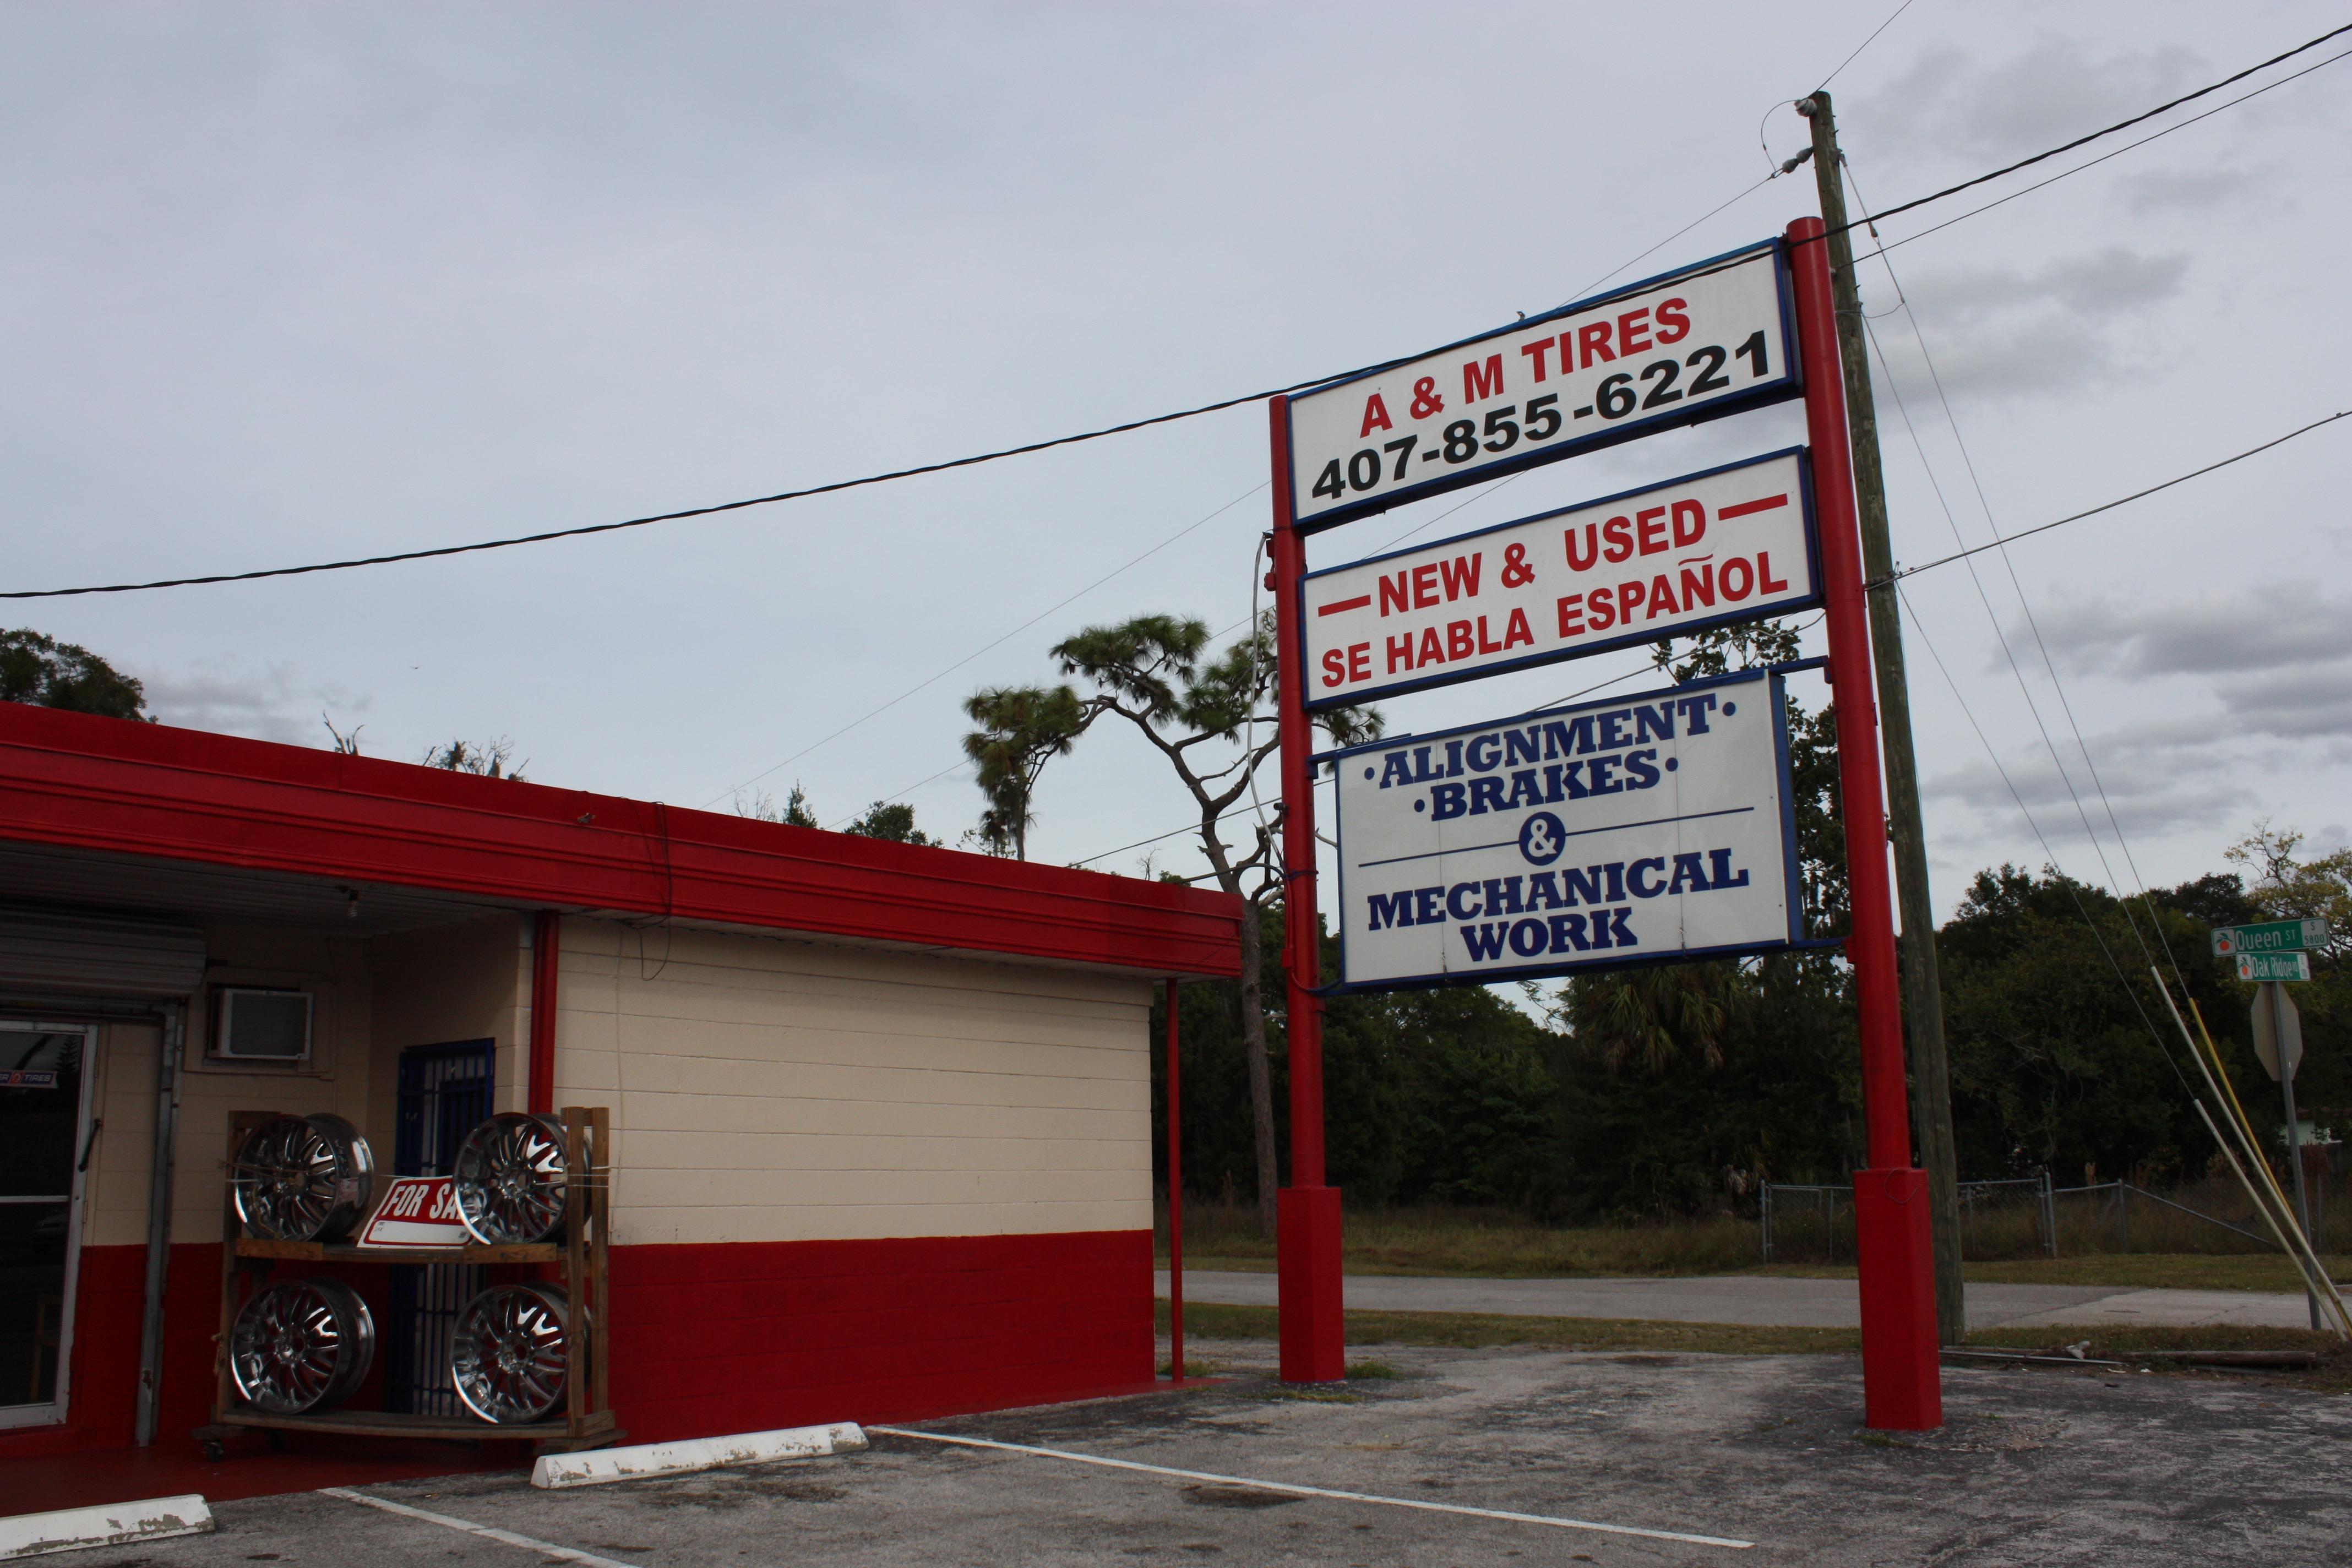 Used Tires Orlando Fl Pine Hills Fl Two Guys Tires And Auto >> A M Tires 101 W Oak Ridge Rd Orlando Fl 32809 Yp Com